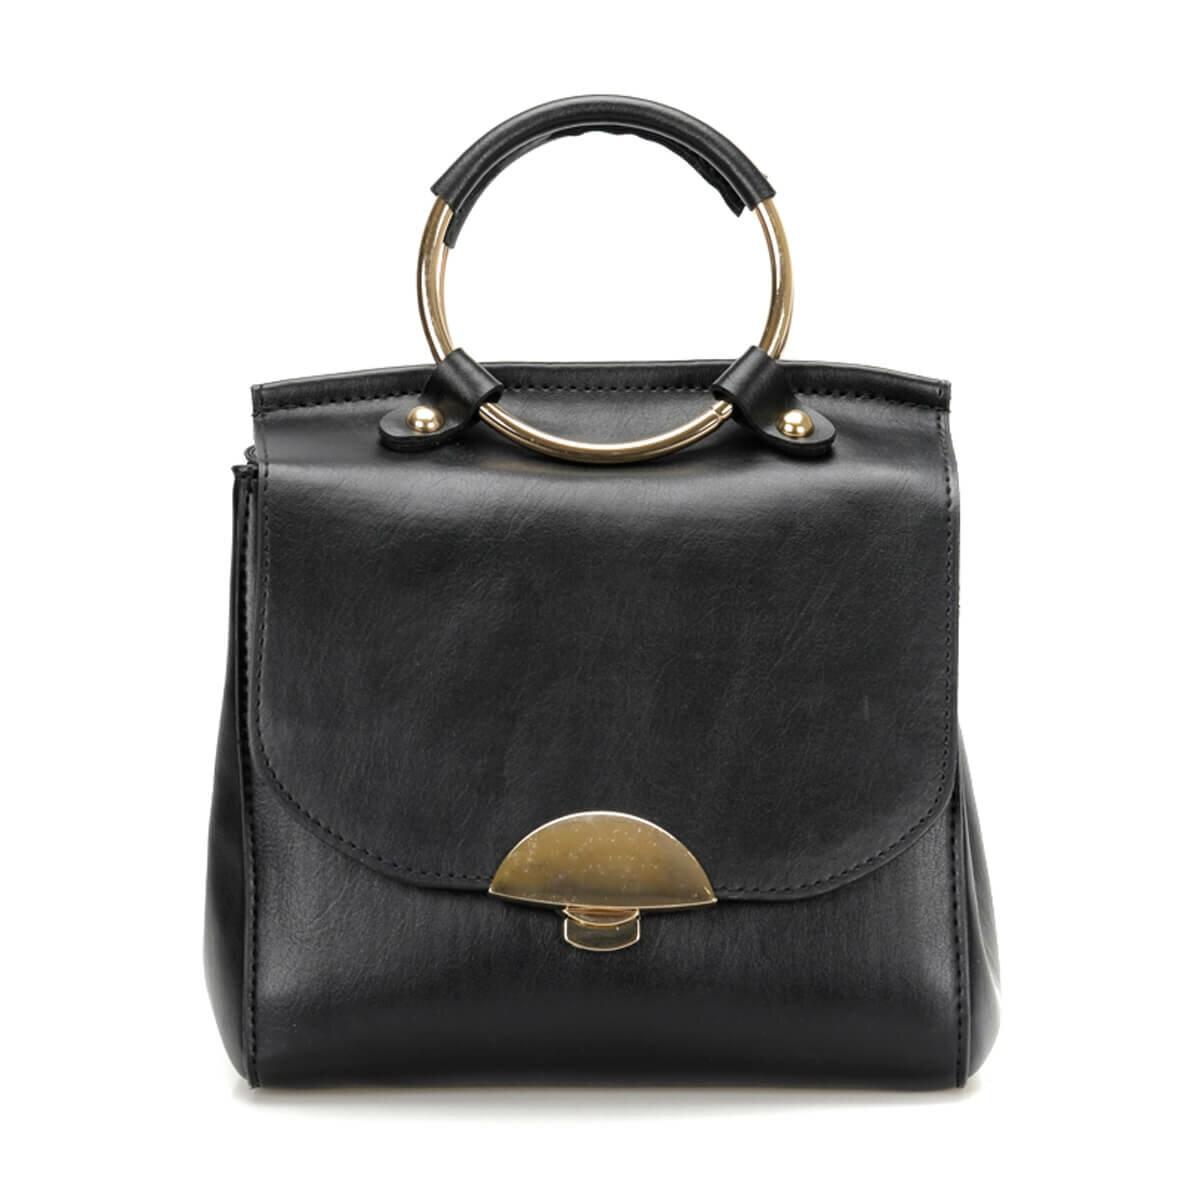 FLO WPCC1404 Black Women Handbag BUTIGO